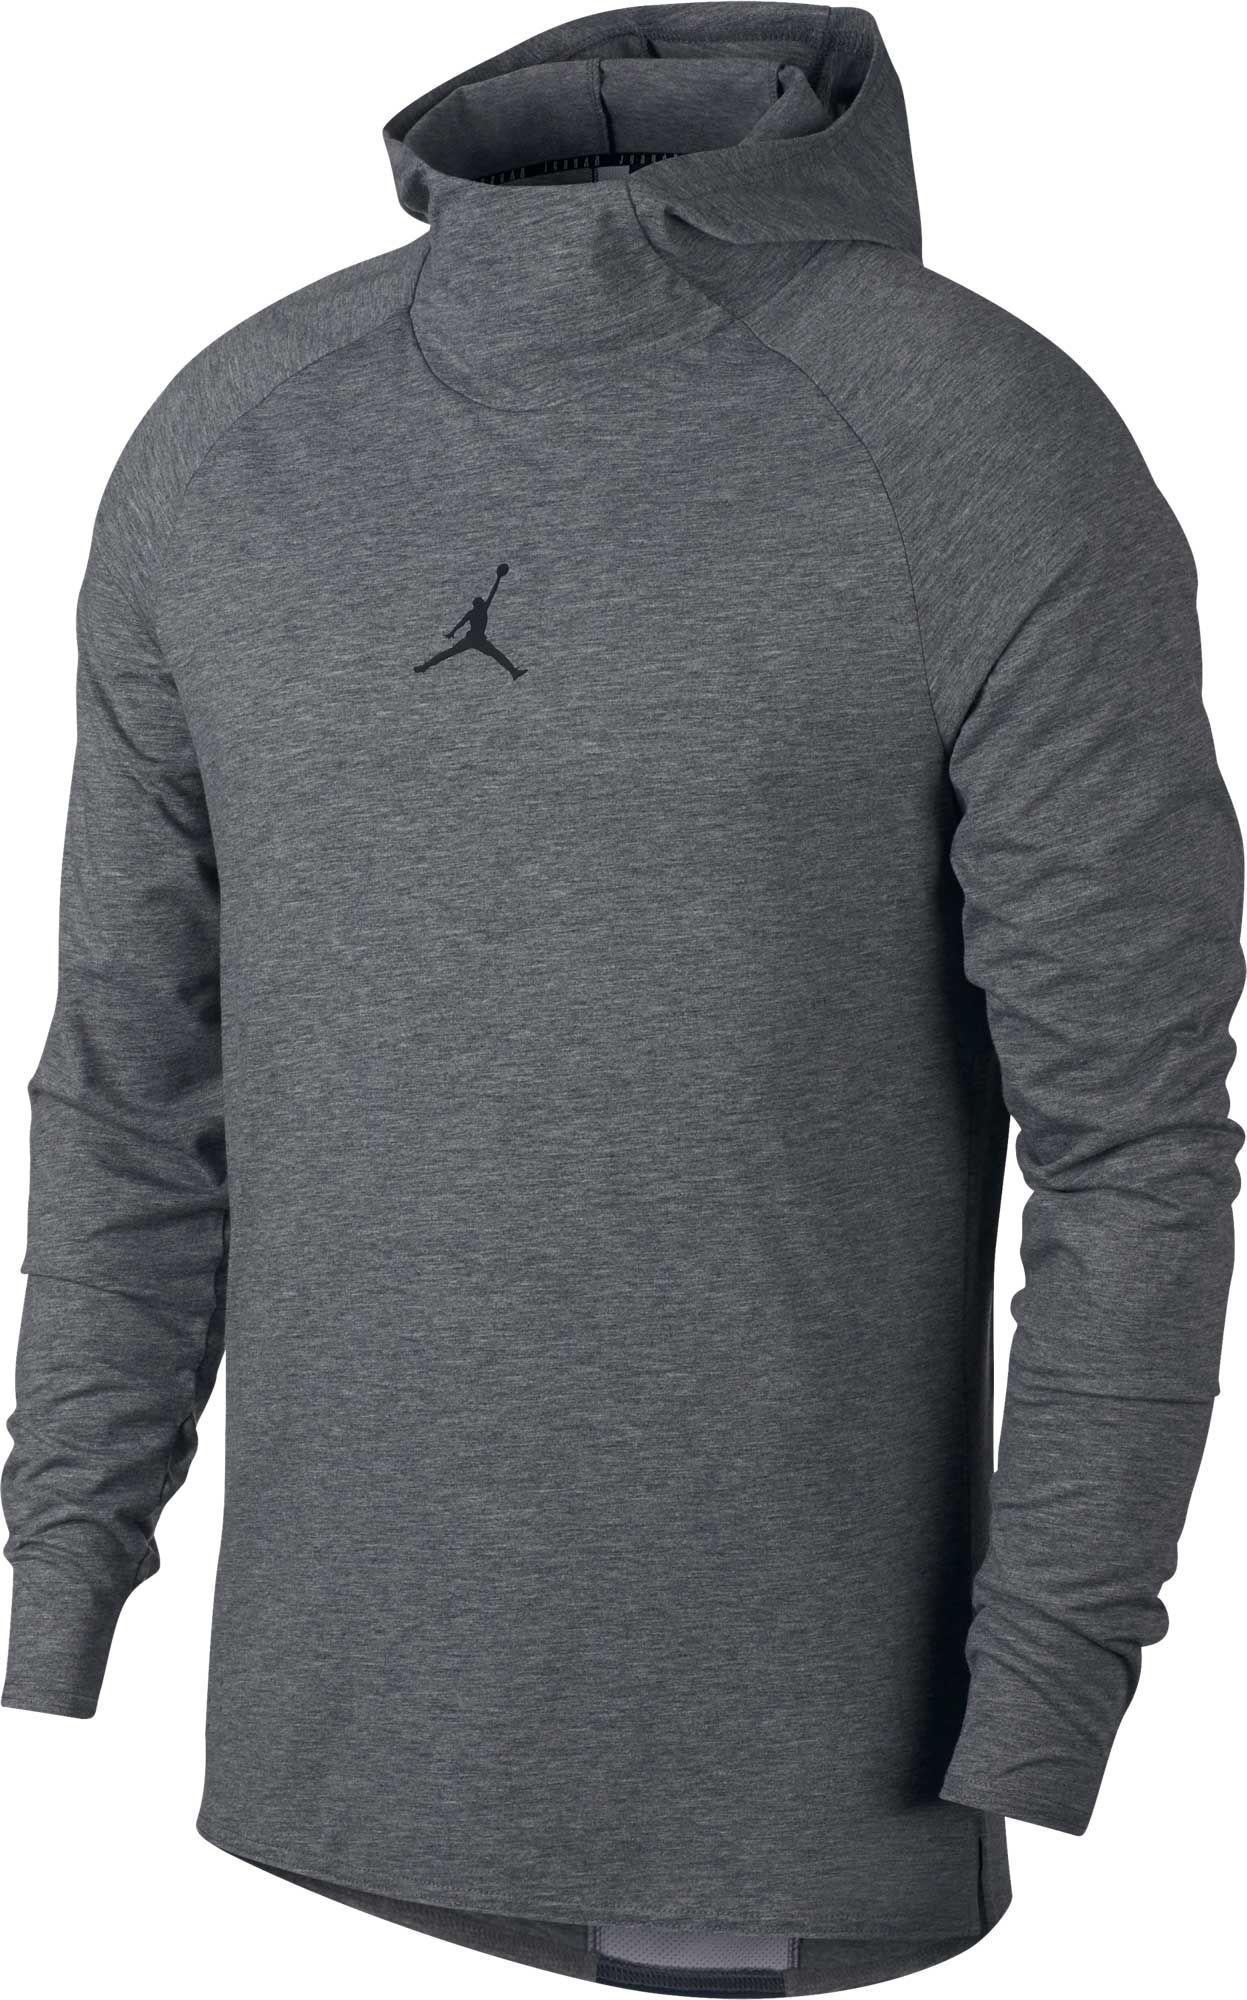 6420b9ac Nike Dry 23 Alpha Training Hooded Long Sleeve Shirt in Gray for Men ...